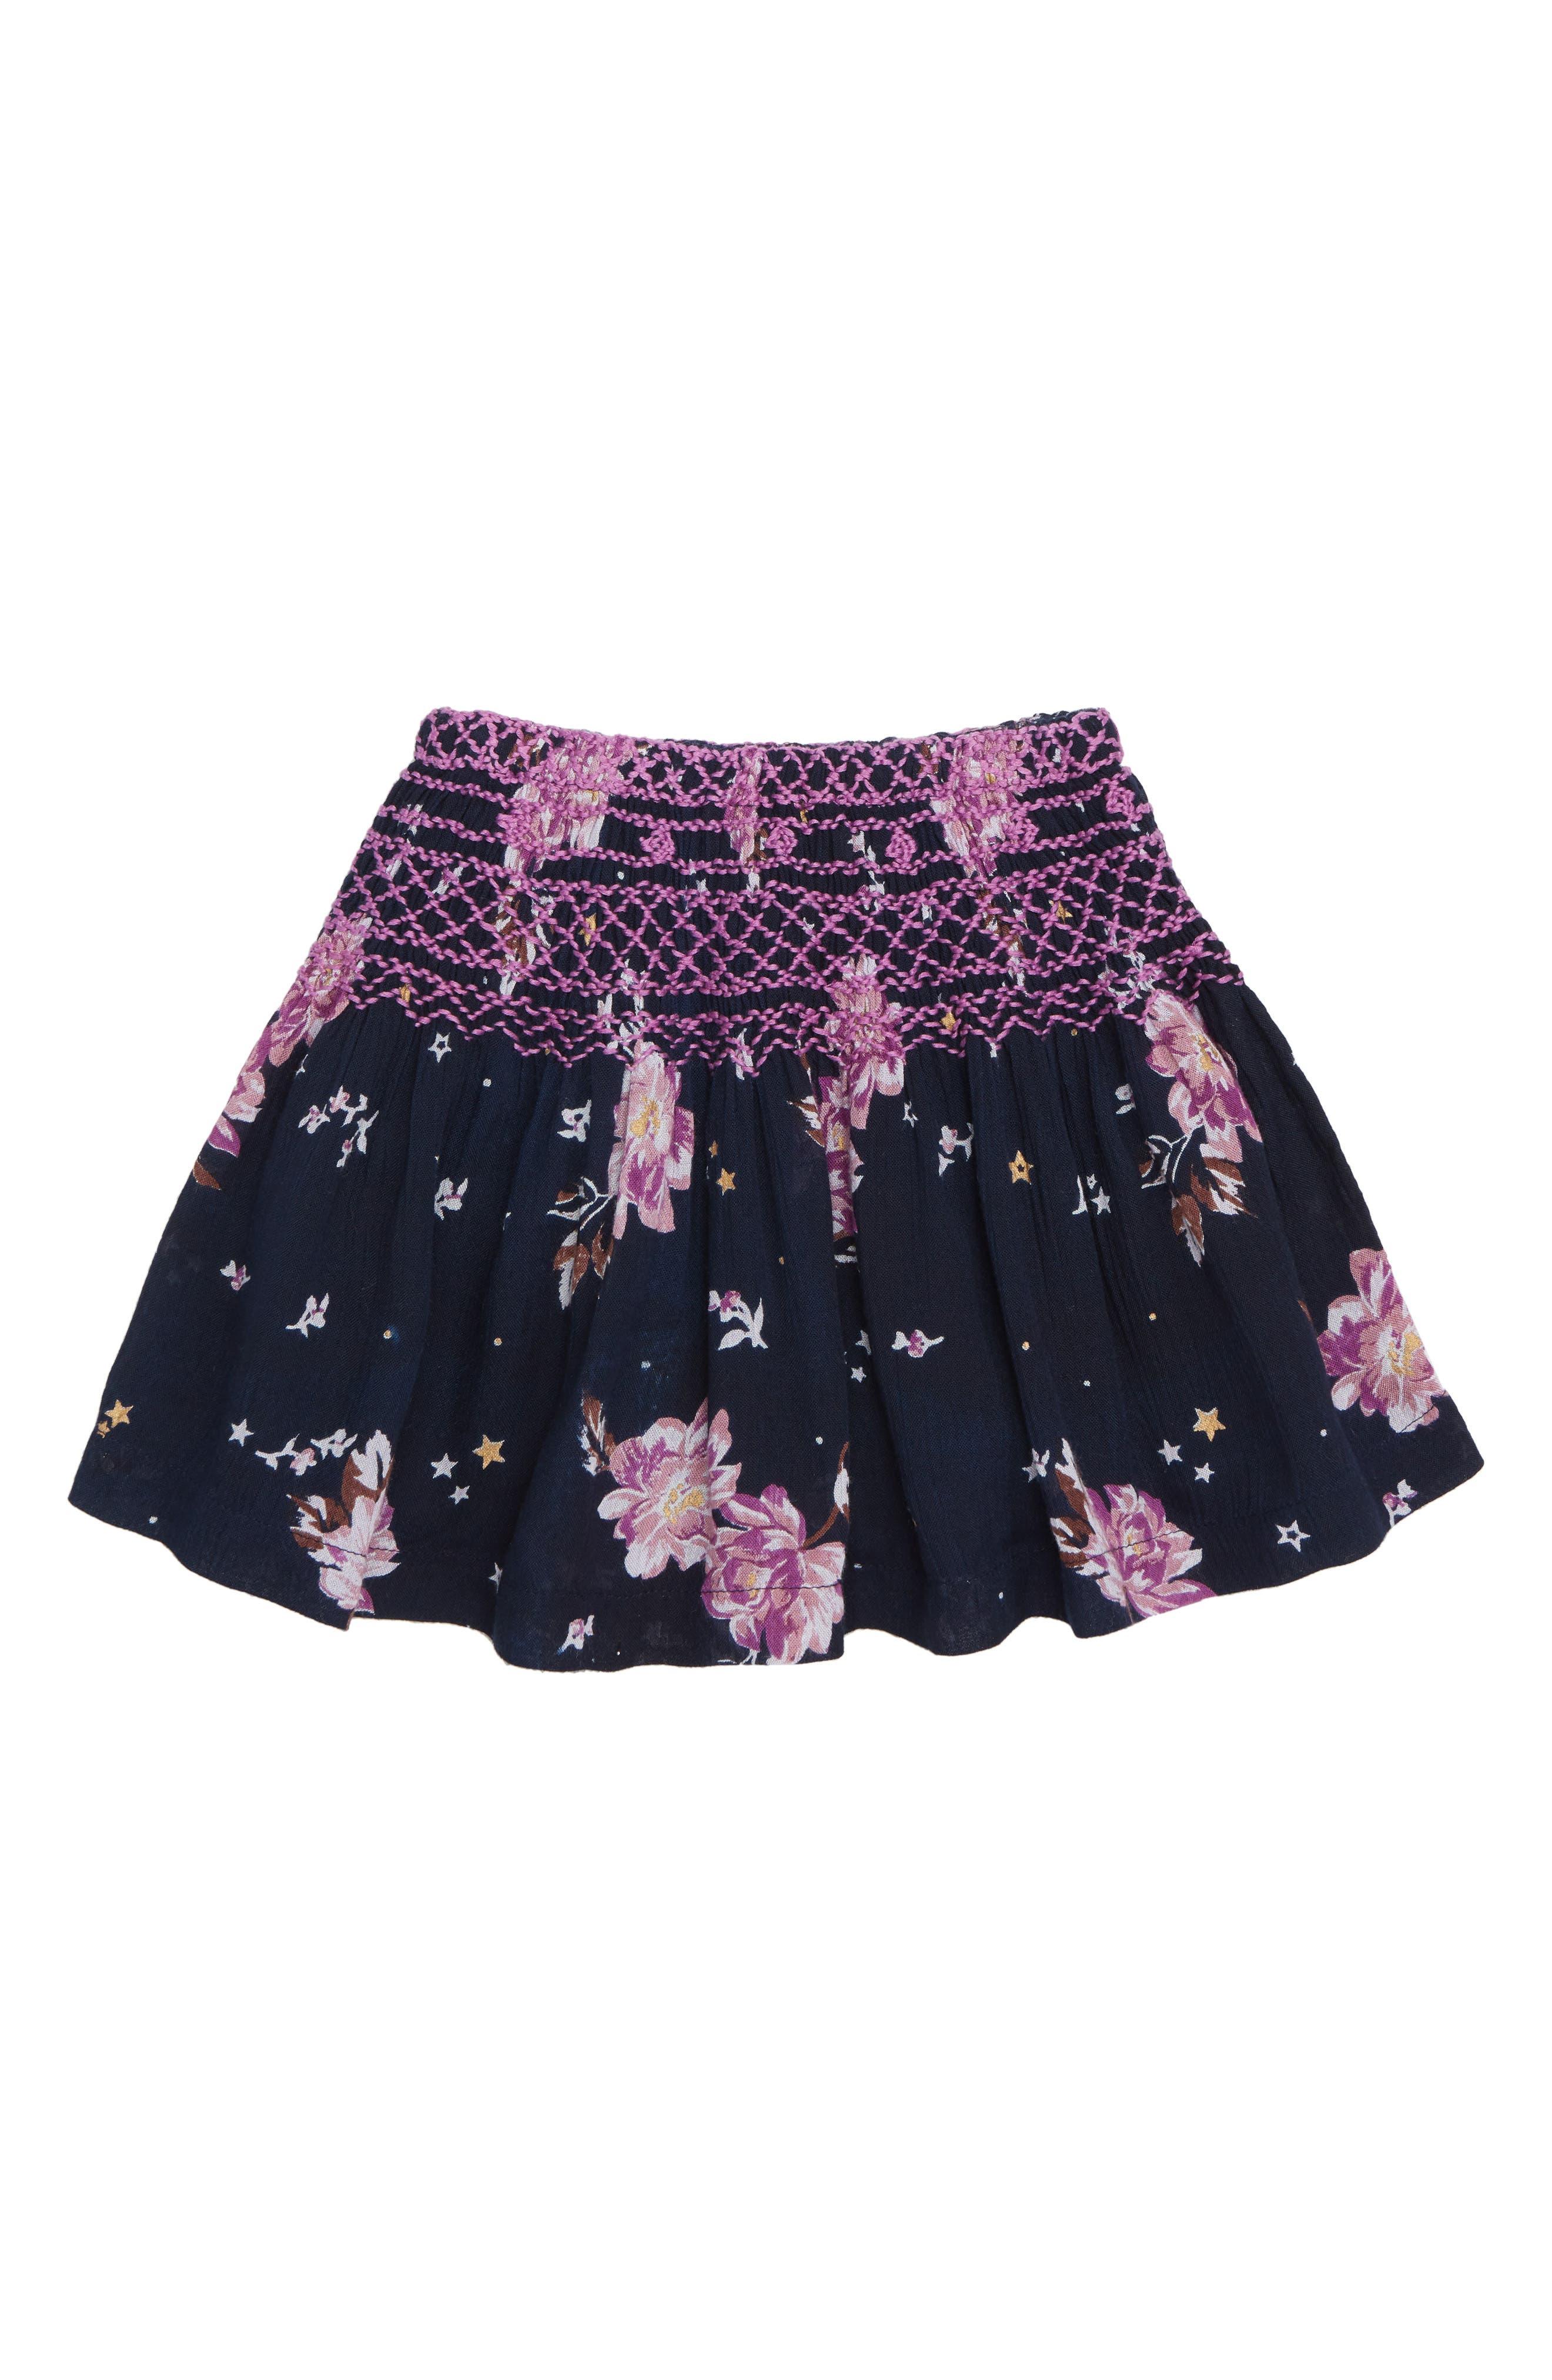 Pixie Skirt,                         Main,                         color, NAVY